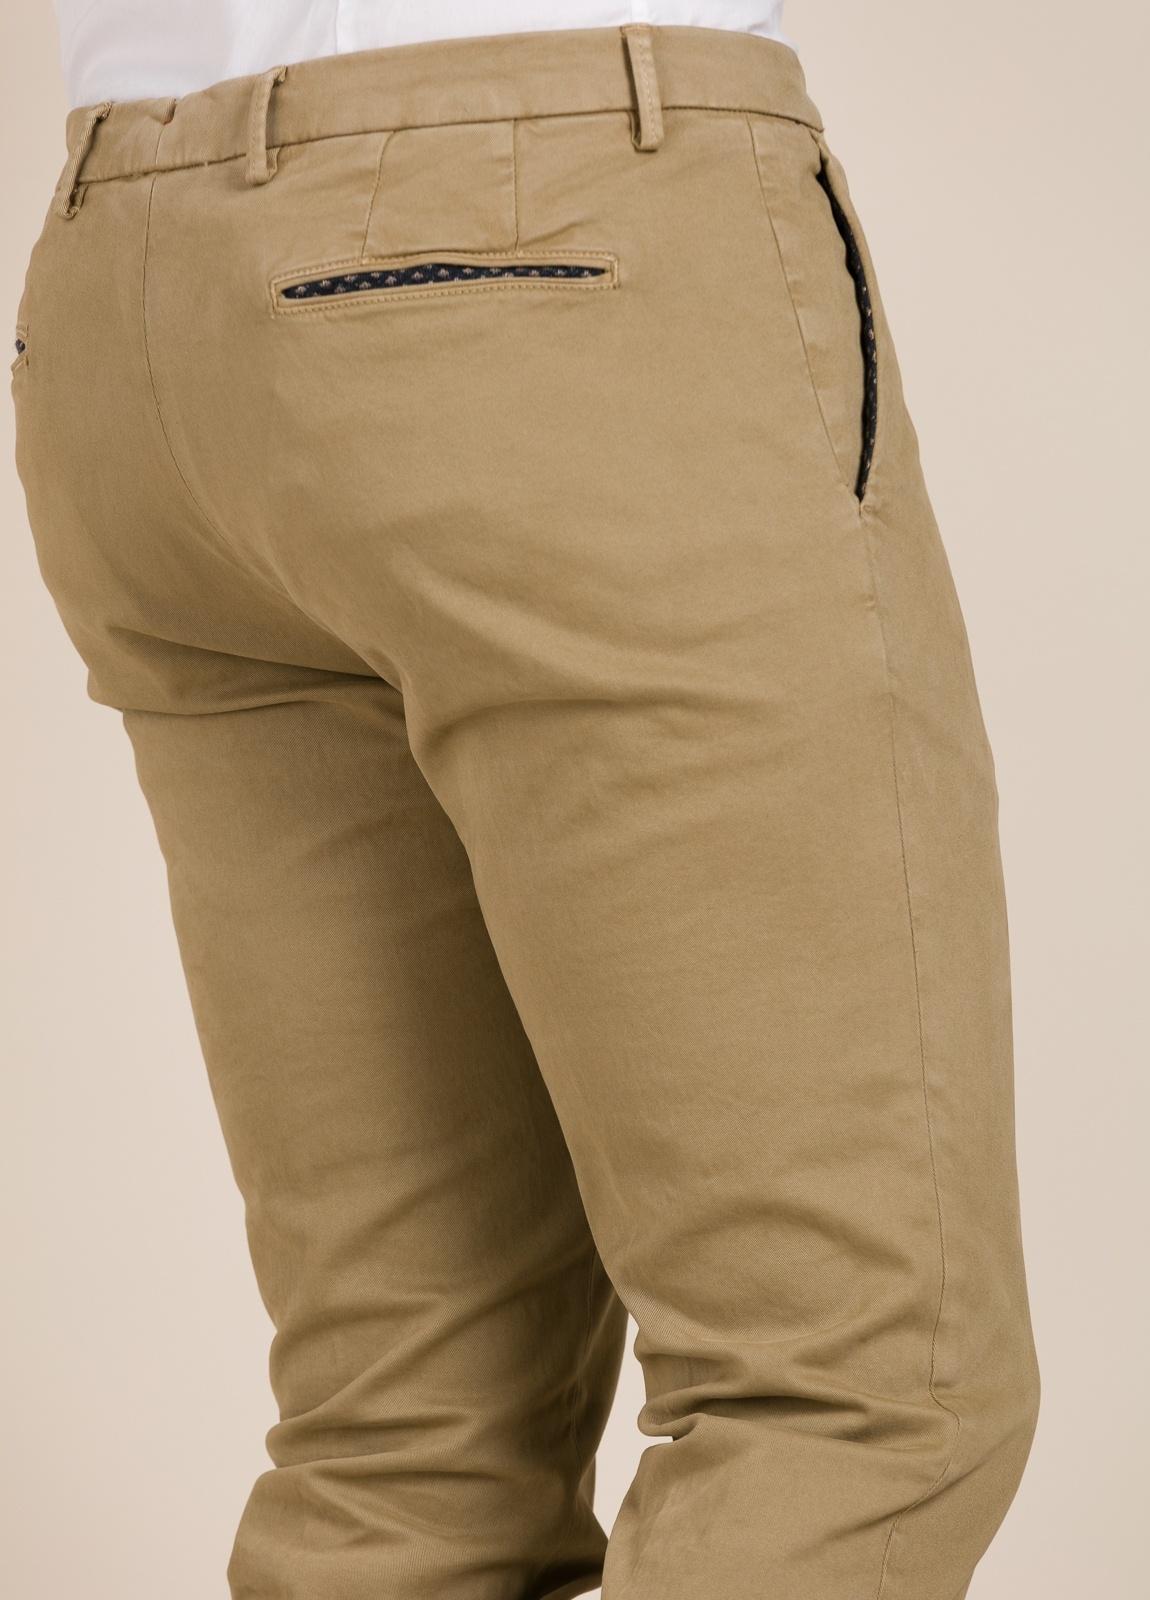 Pantalón chino PAOLONI beige. - Ítem1